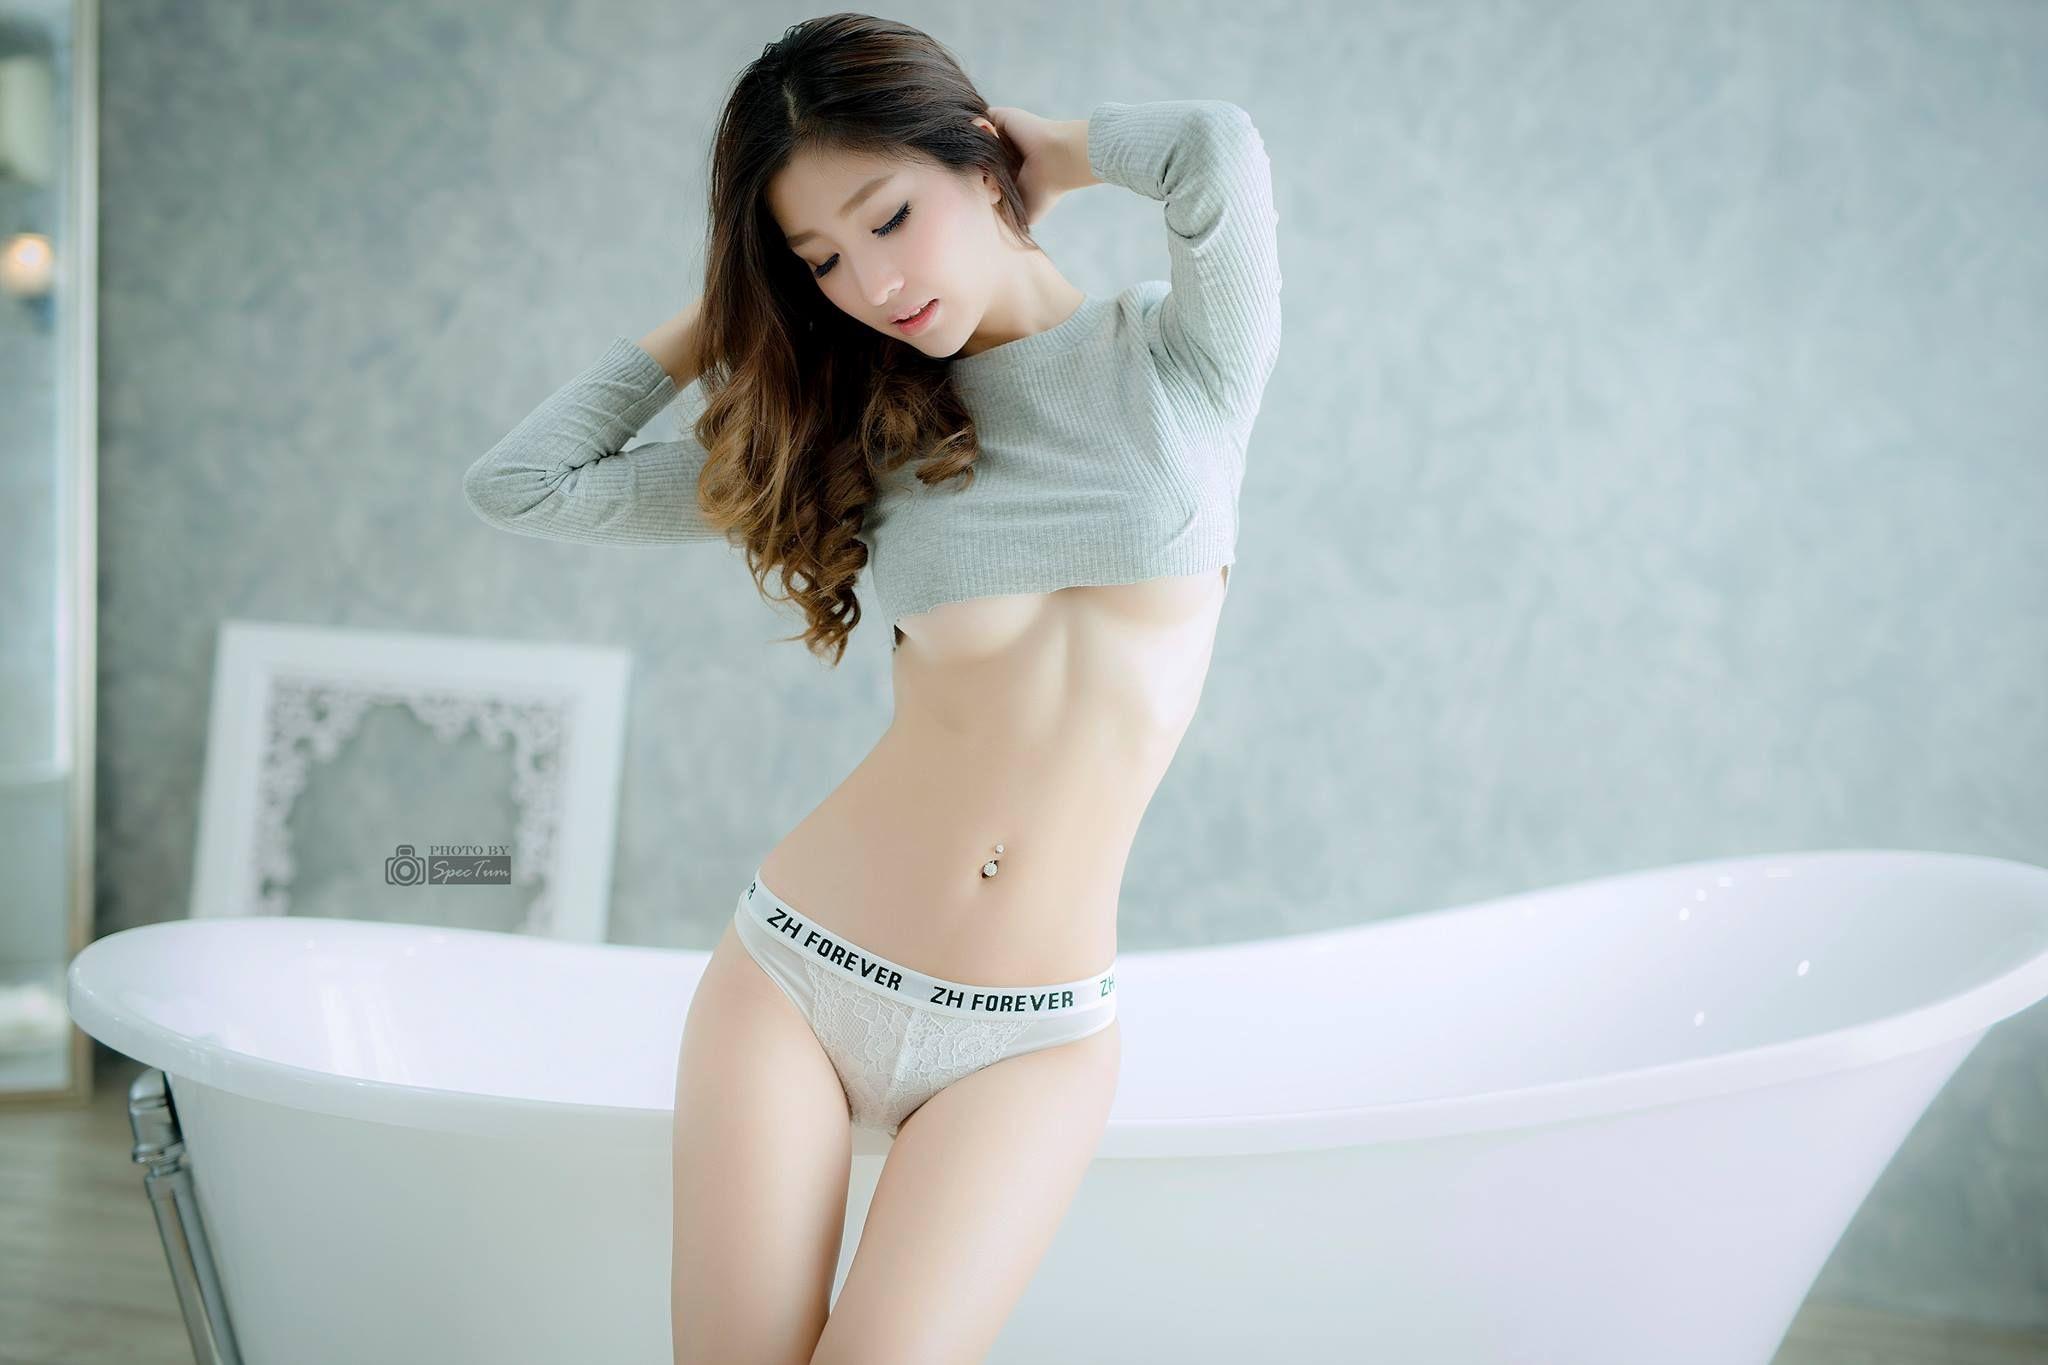 Cum woman asian otngagged